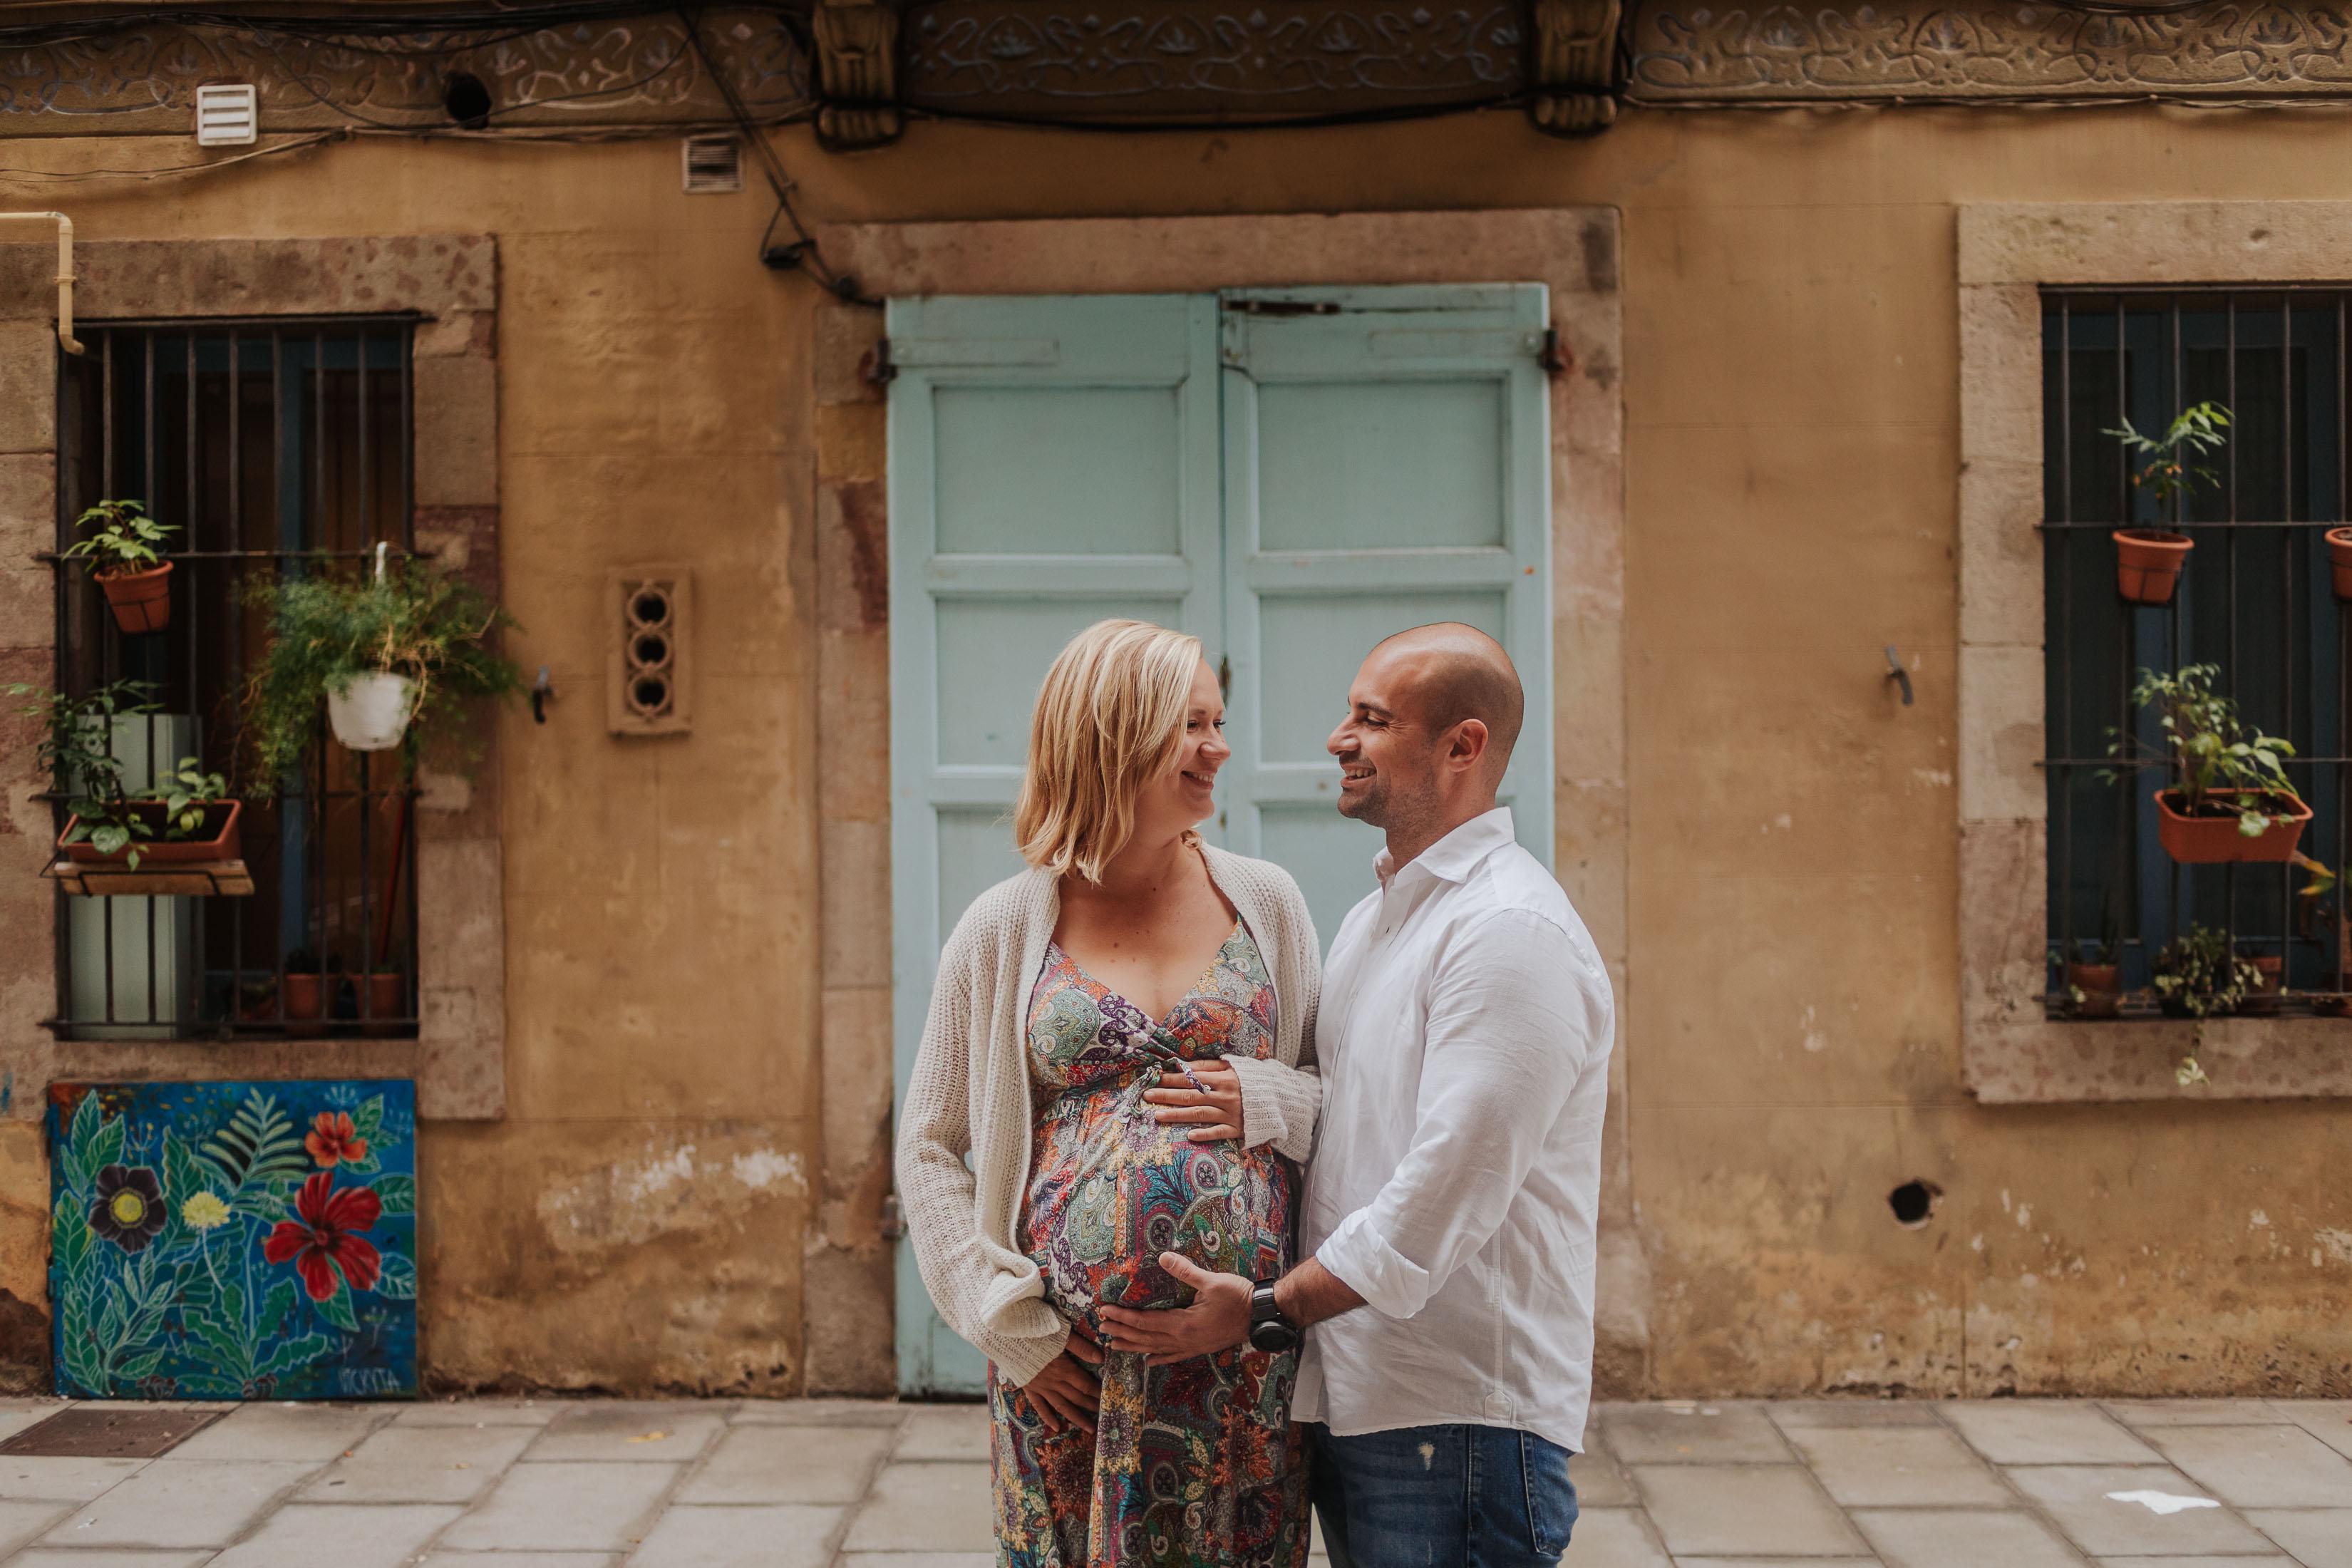 Fotógrafo embarazo Barcelona :: Fotógrafo embarazada Barcelona :: La Barceloneta :: Amanecer :: Salida del sol :: Pareja embarazada